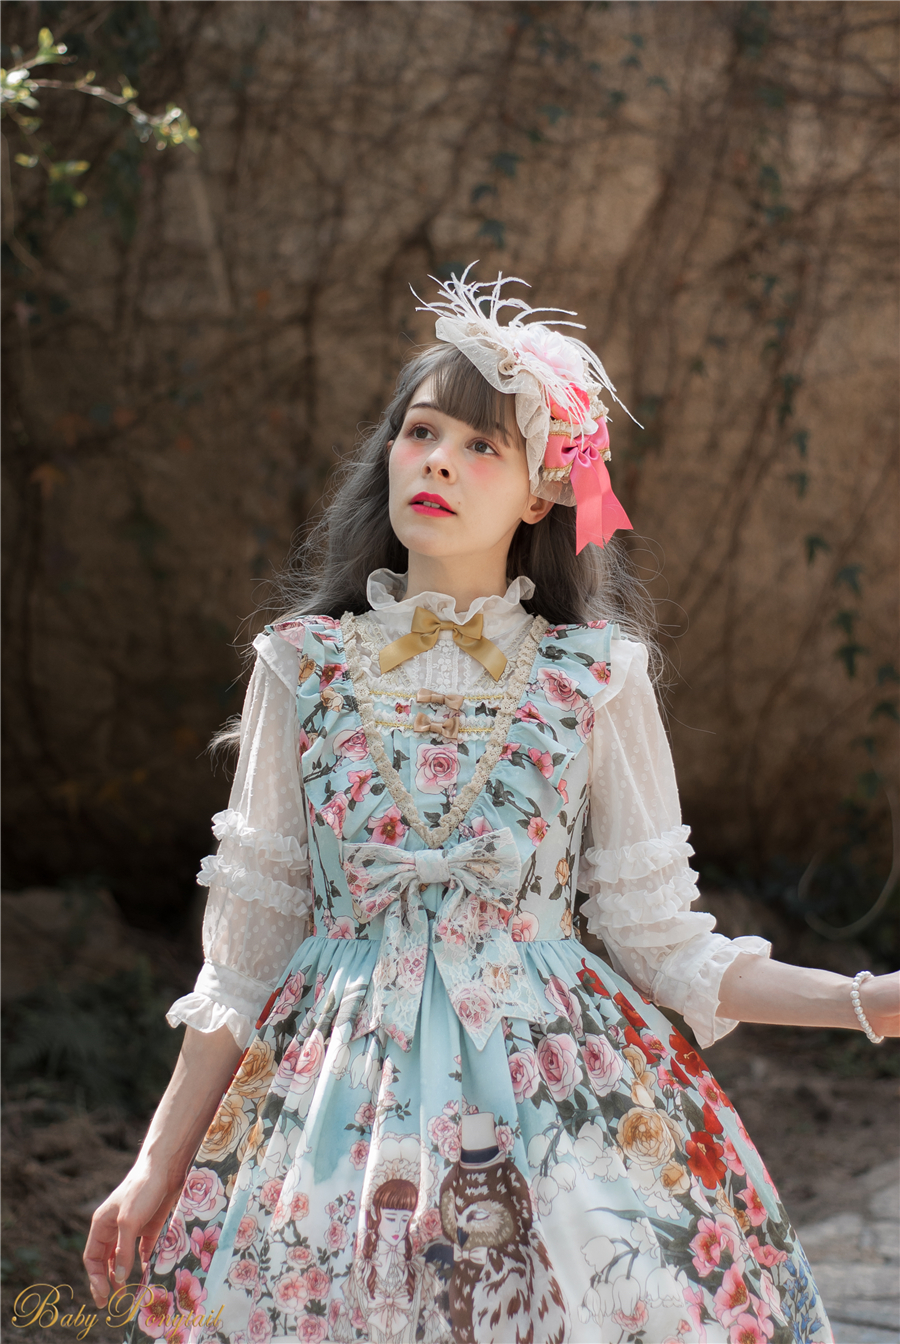 Baby Ponytail_Model Photo_Polly's Garden of Dreams_JSK Sky_Claudia04.jpg